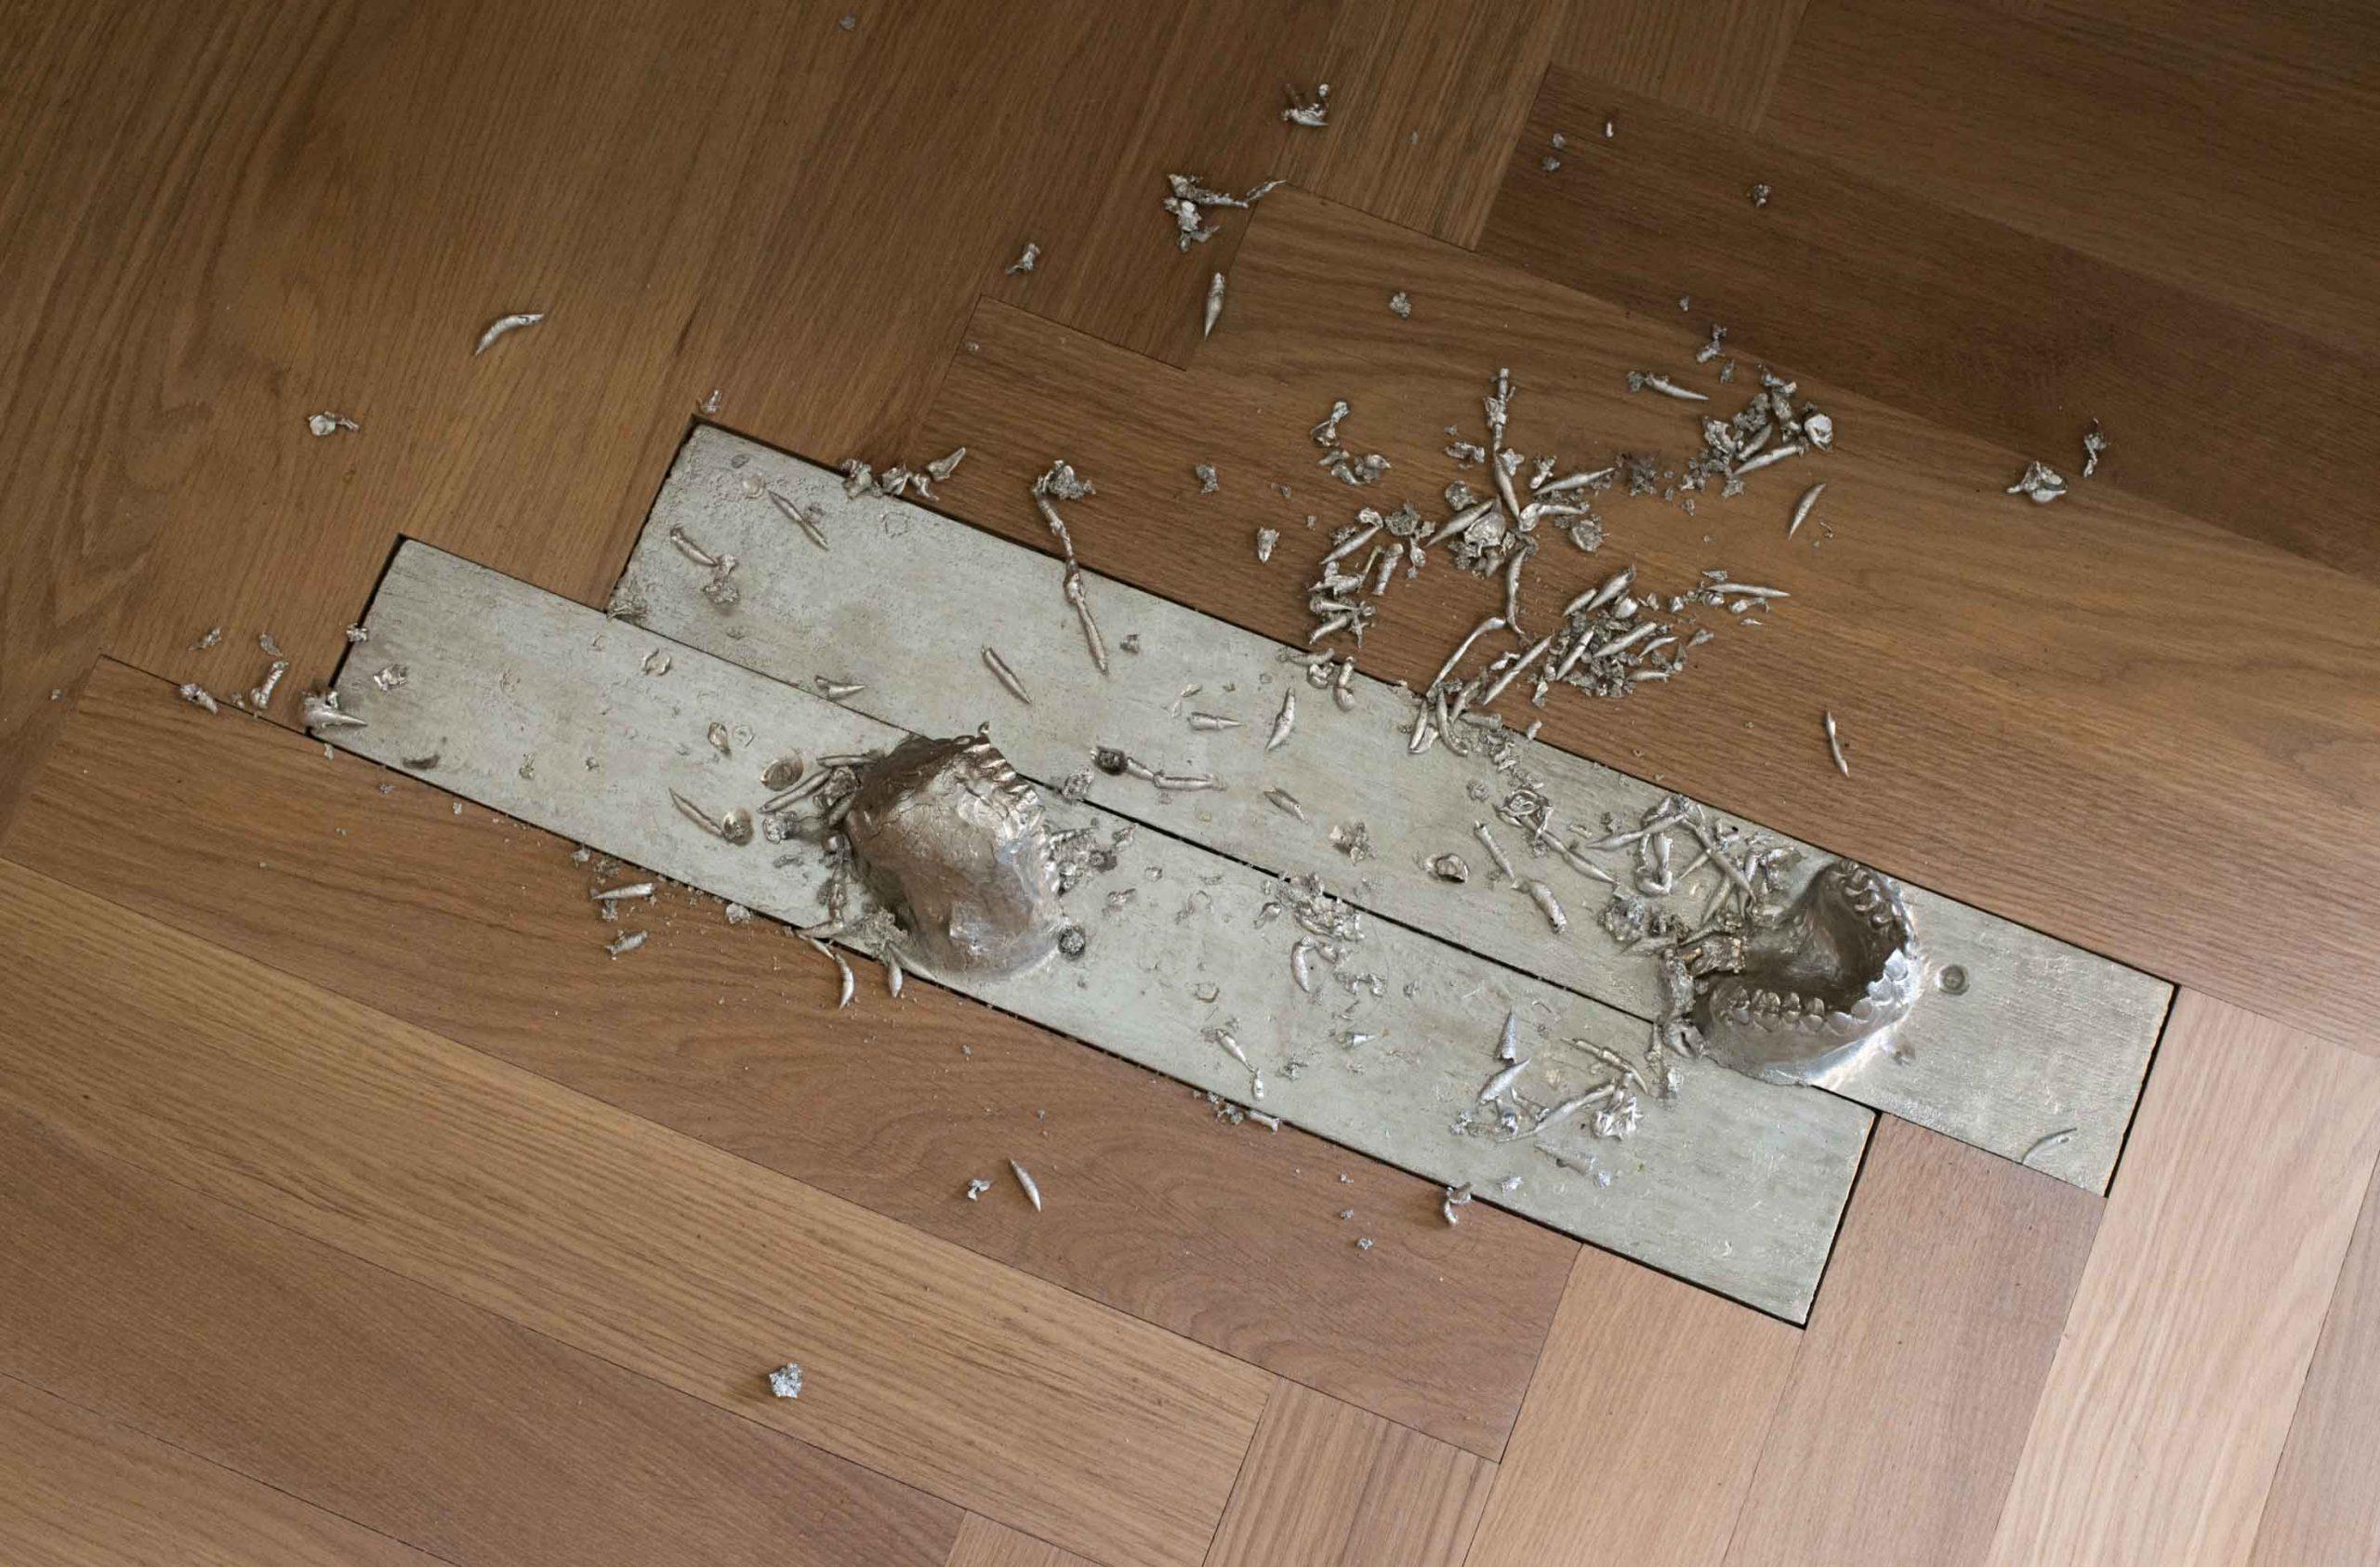 floor-work_Luka-Jana-Berchtold_2021_cSusanne-Reiterer-6